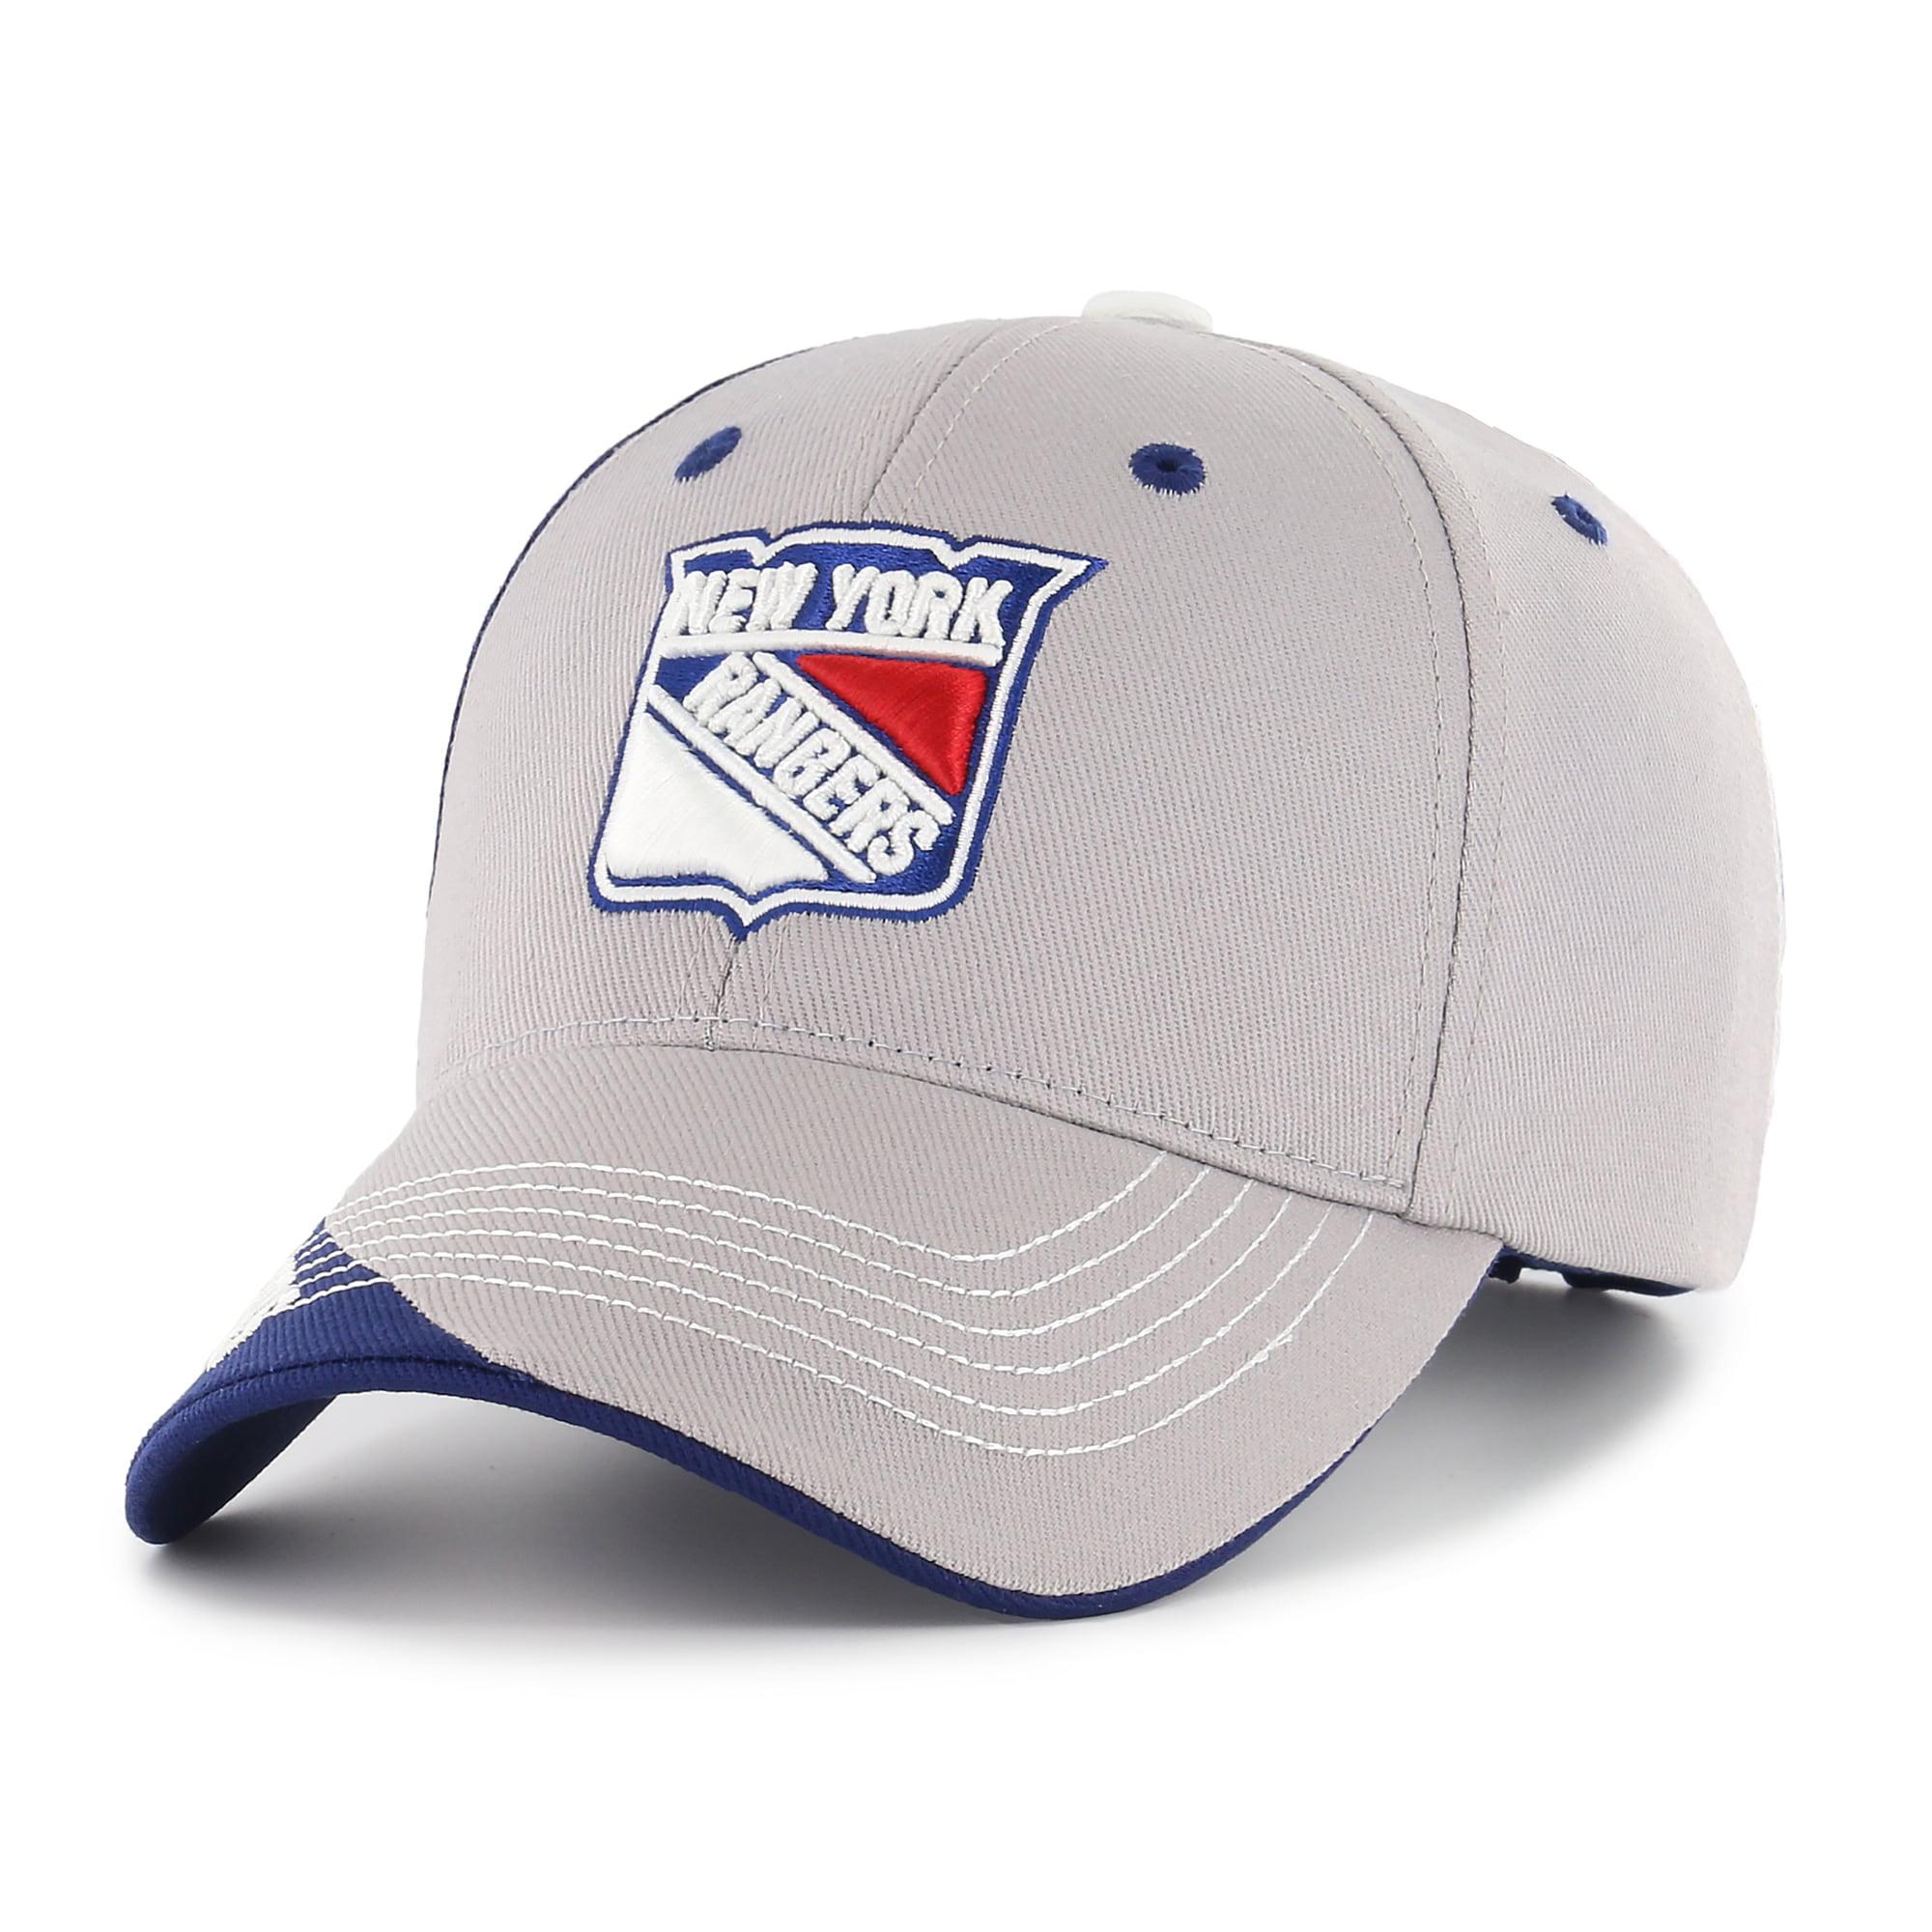 NHL New York Rangers Hubris Cap - Fan Favorite